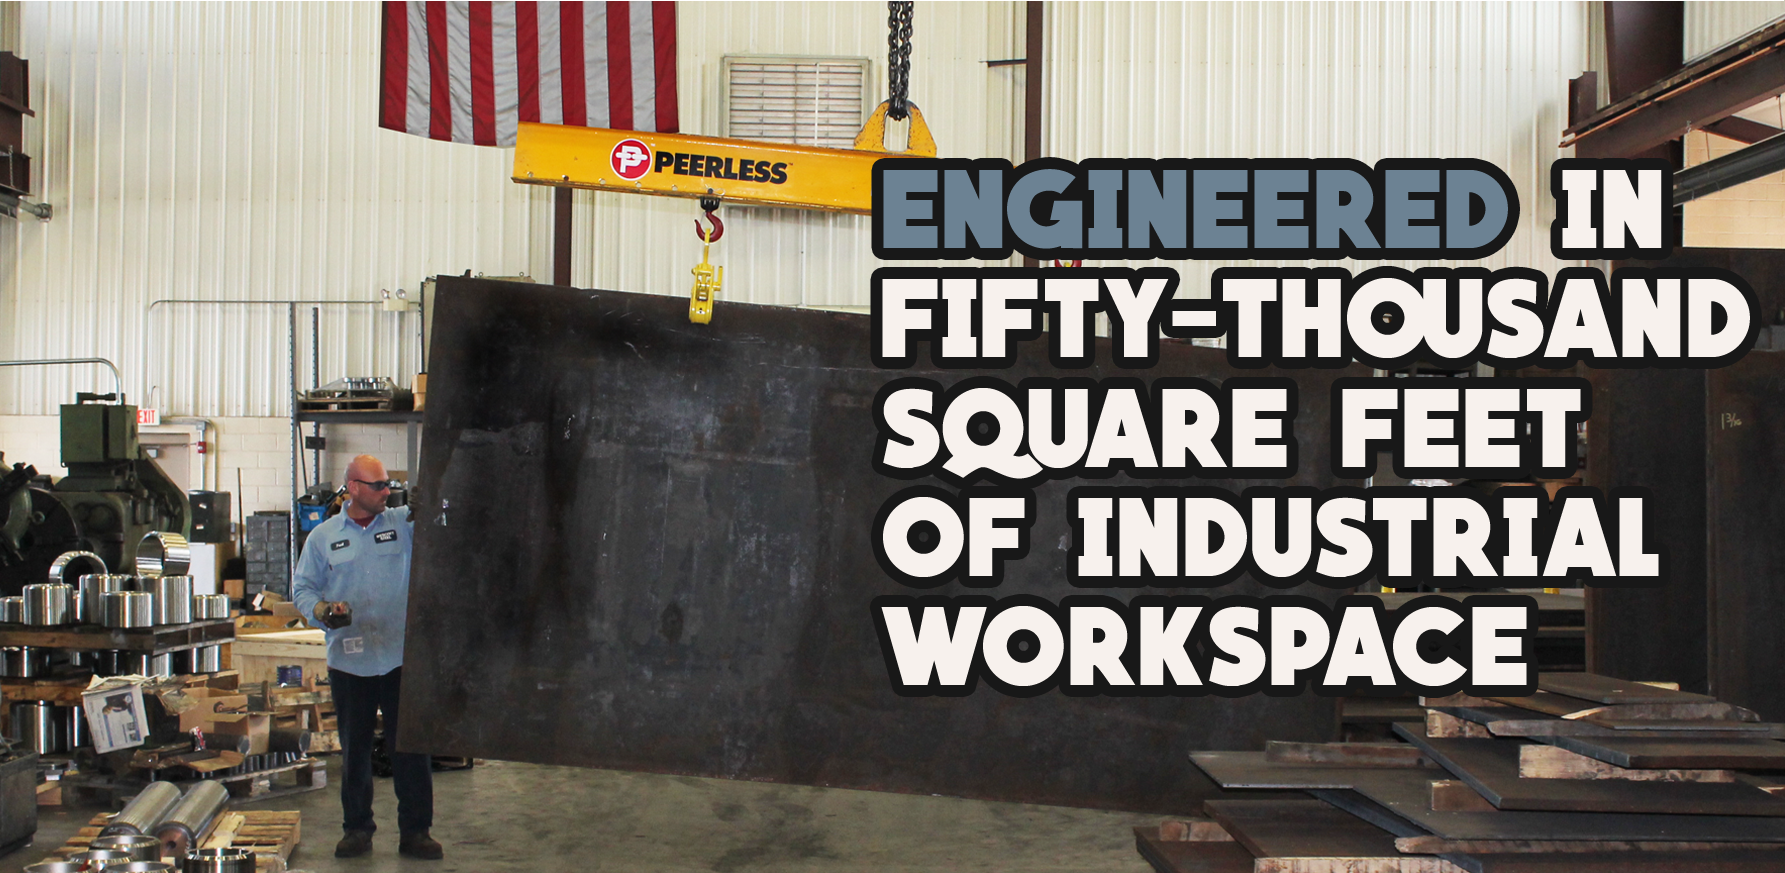 Wescott Steel Industrial Workspace